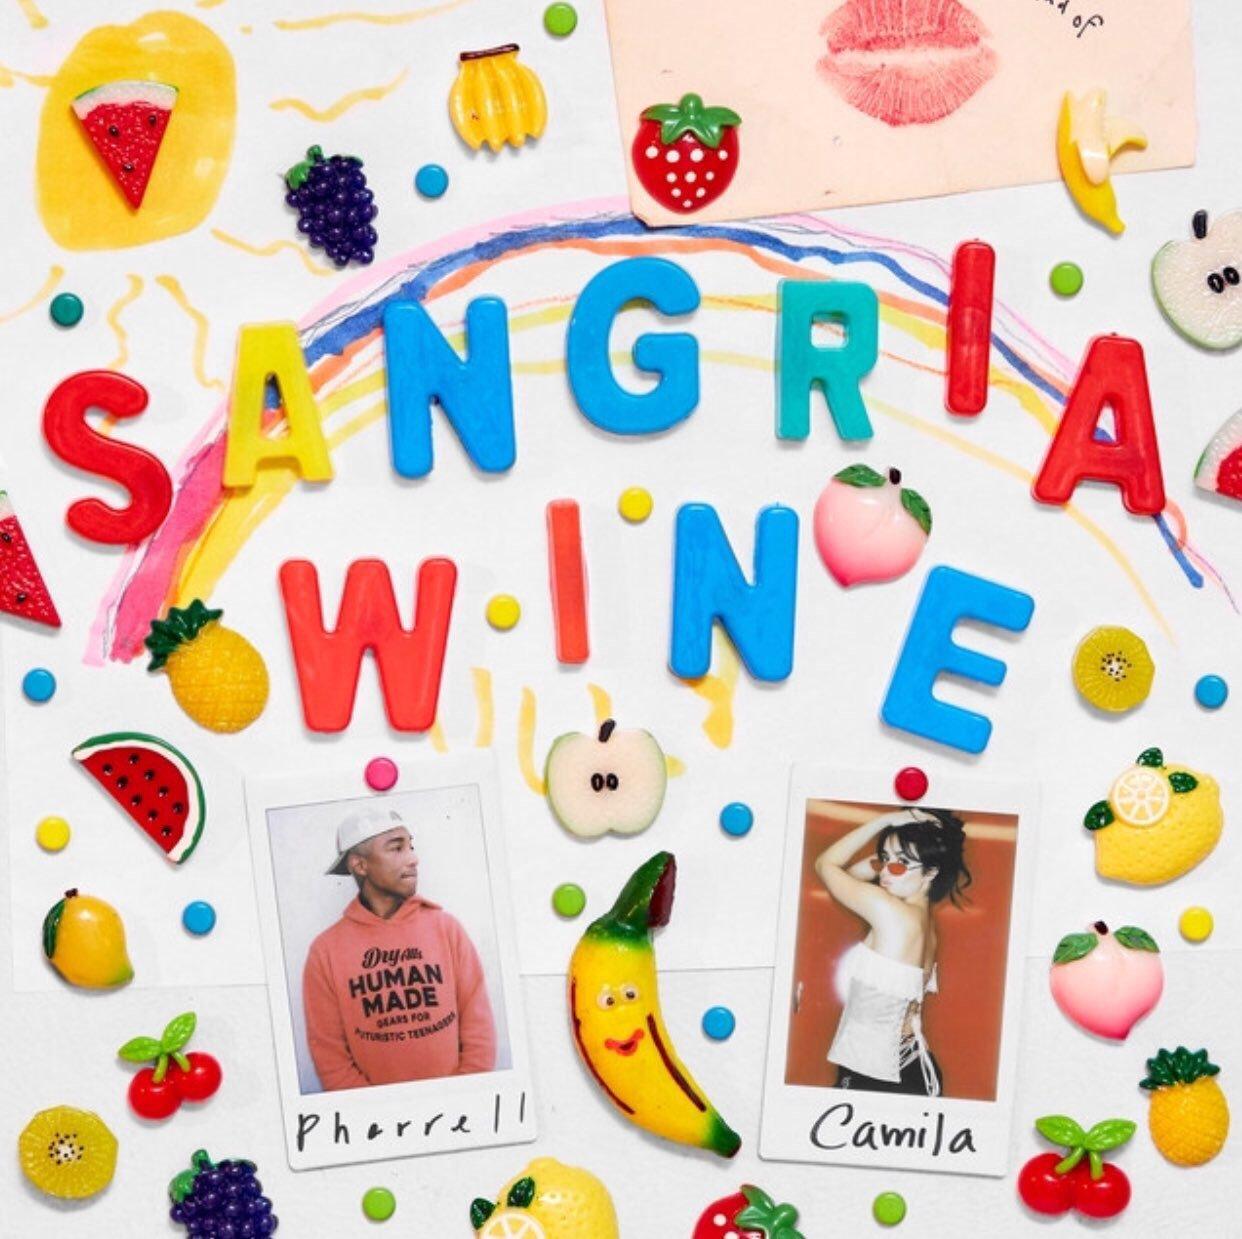 Despite not Impacting Pop Radio until June 5th, 'Sangria Wine' has already been added by 13 Pop Radio stations! https://t.co/Ij7MbguFV8